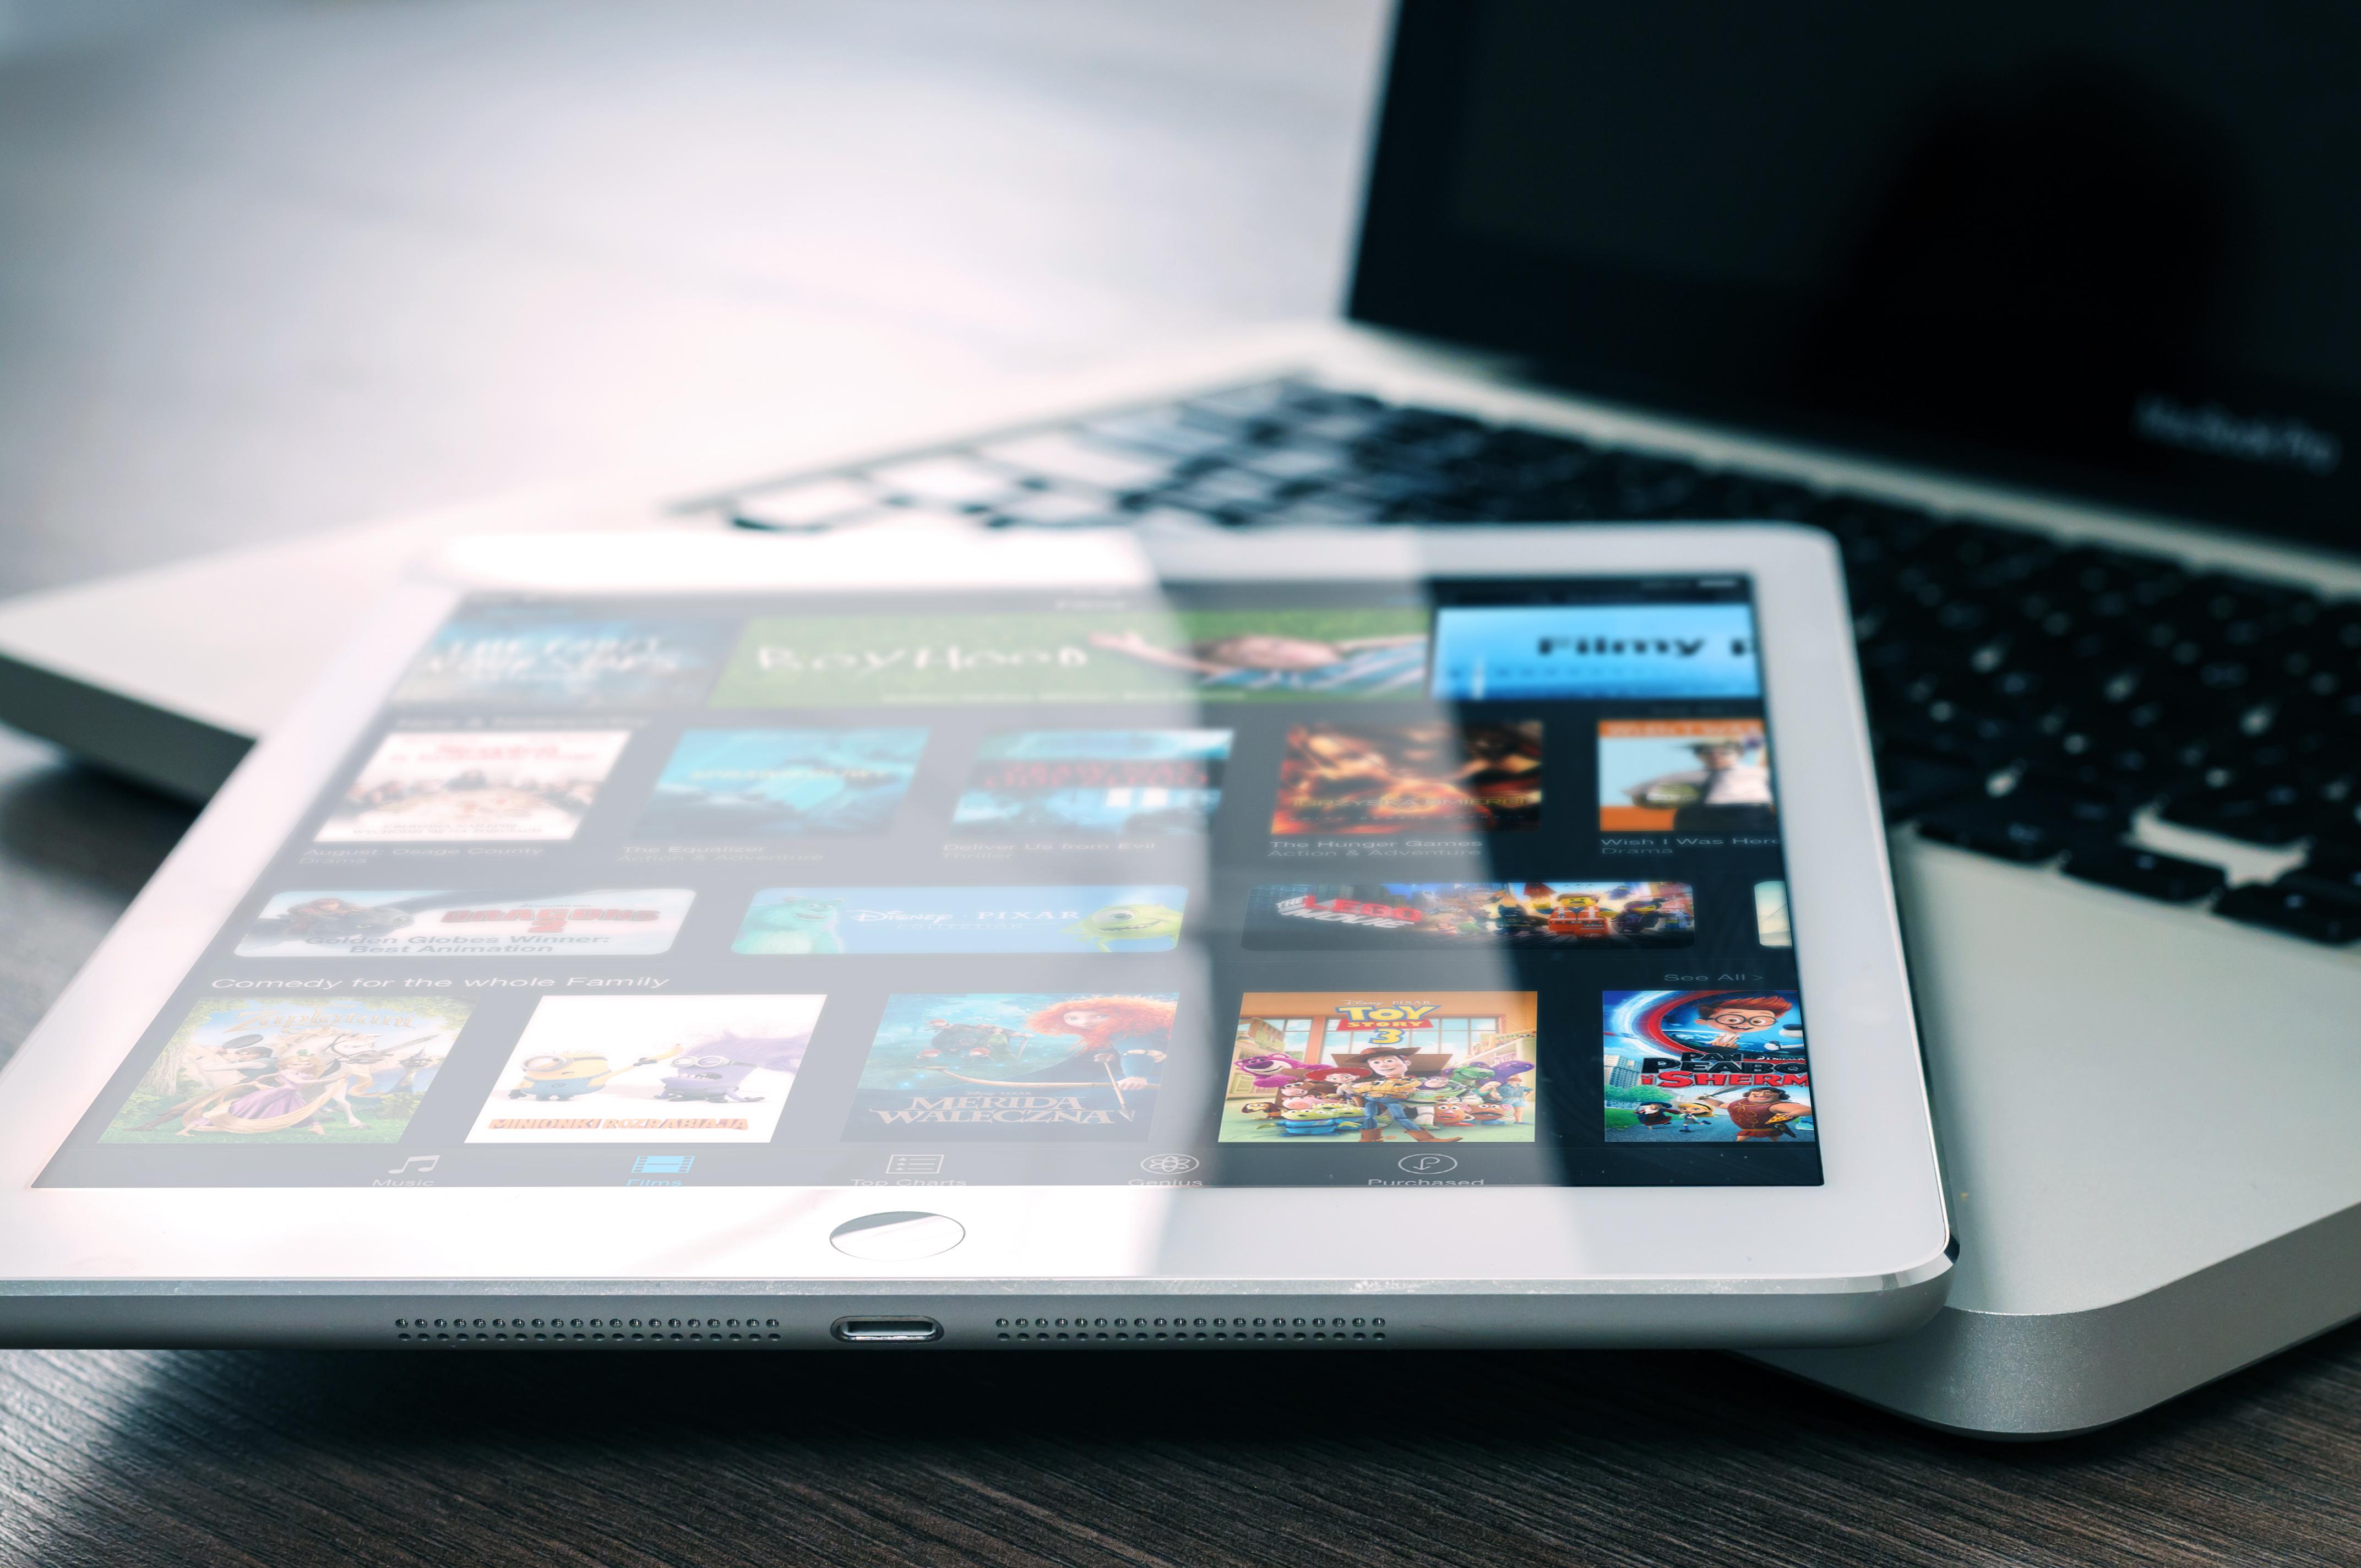 Xperia Z4 Tabletの Wi-Fi モデルが登場! iPad Air2とのスペック差は?